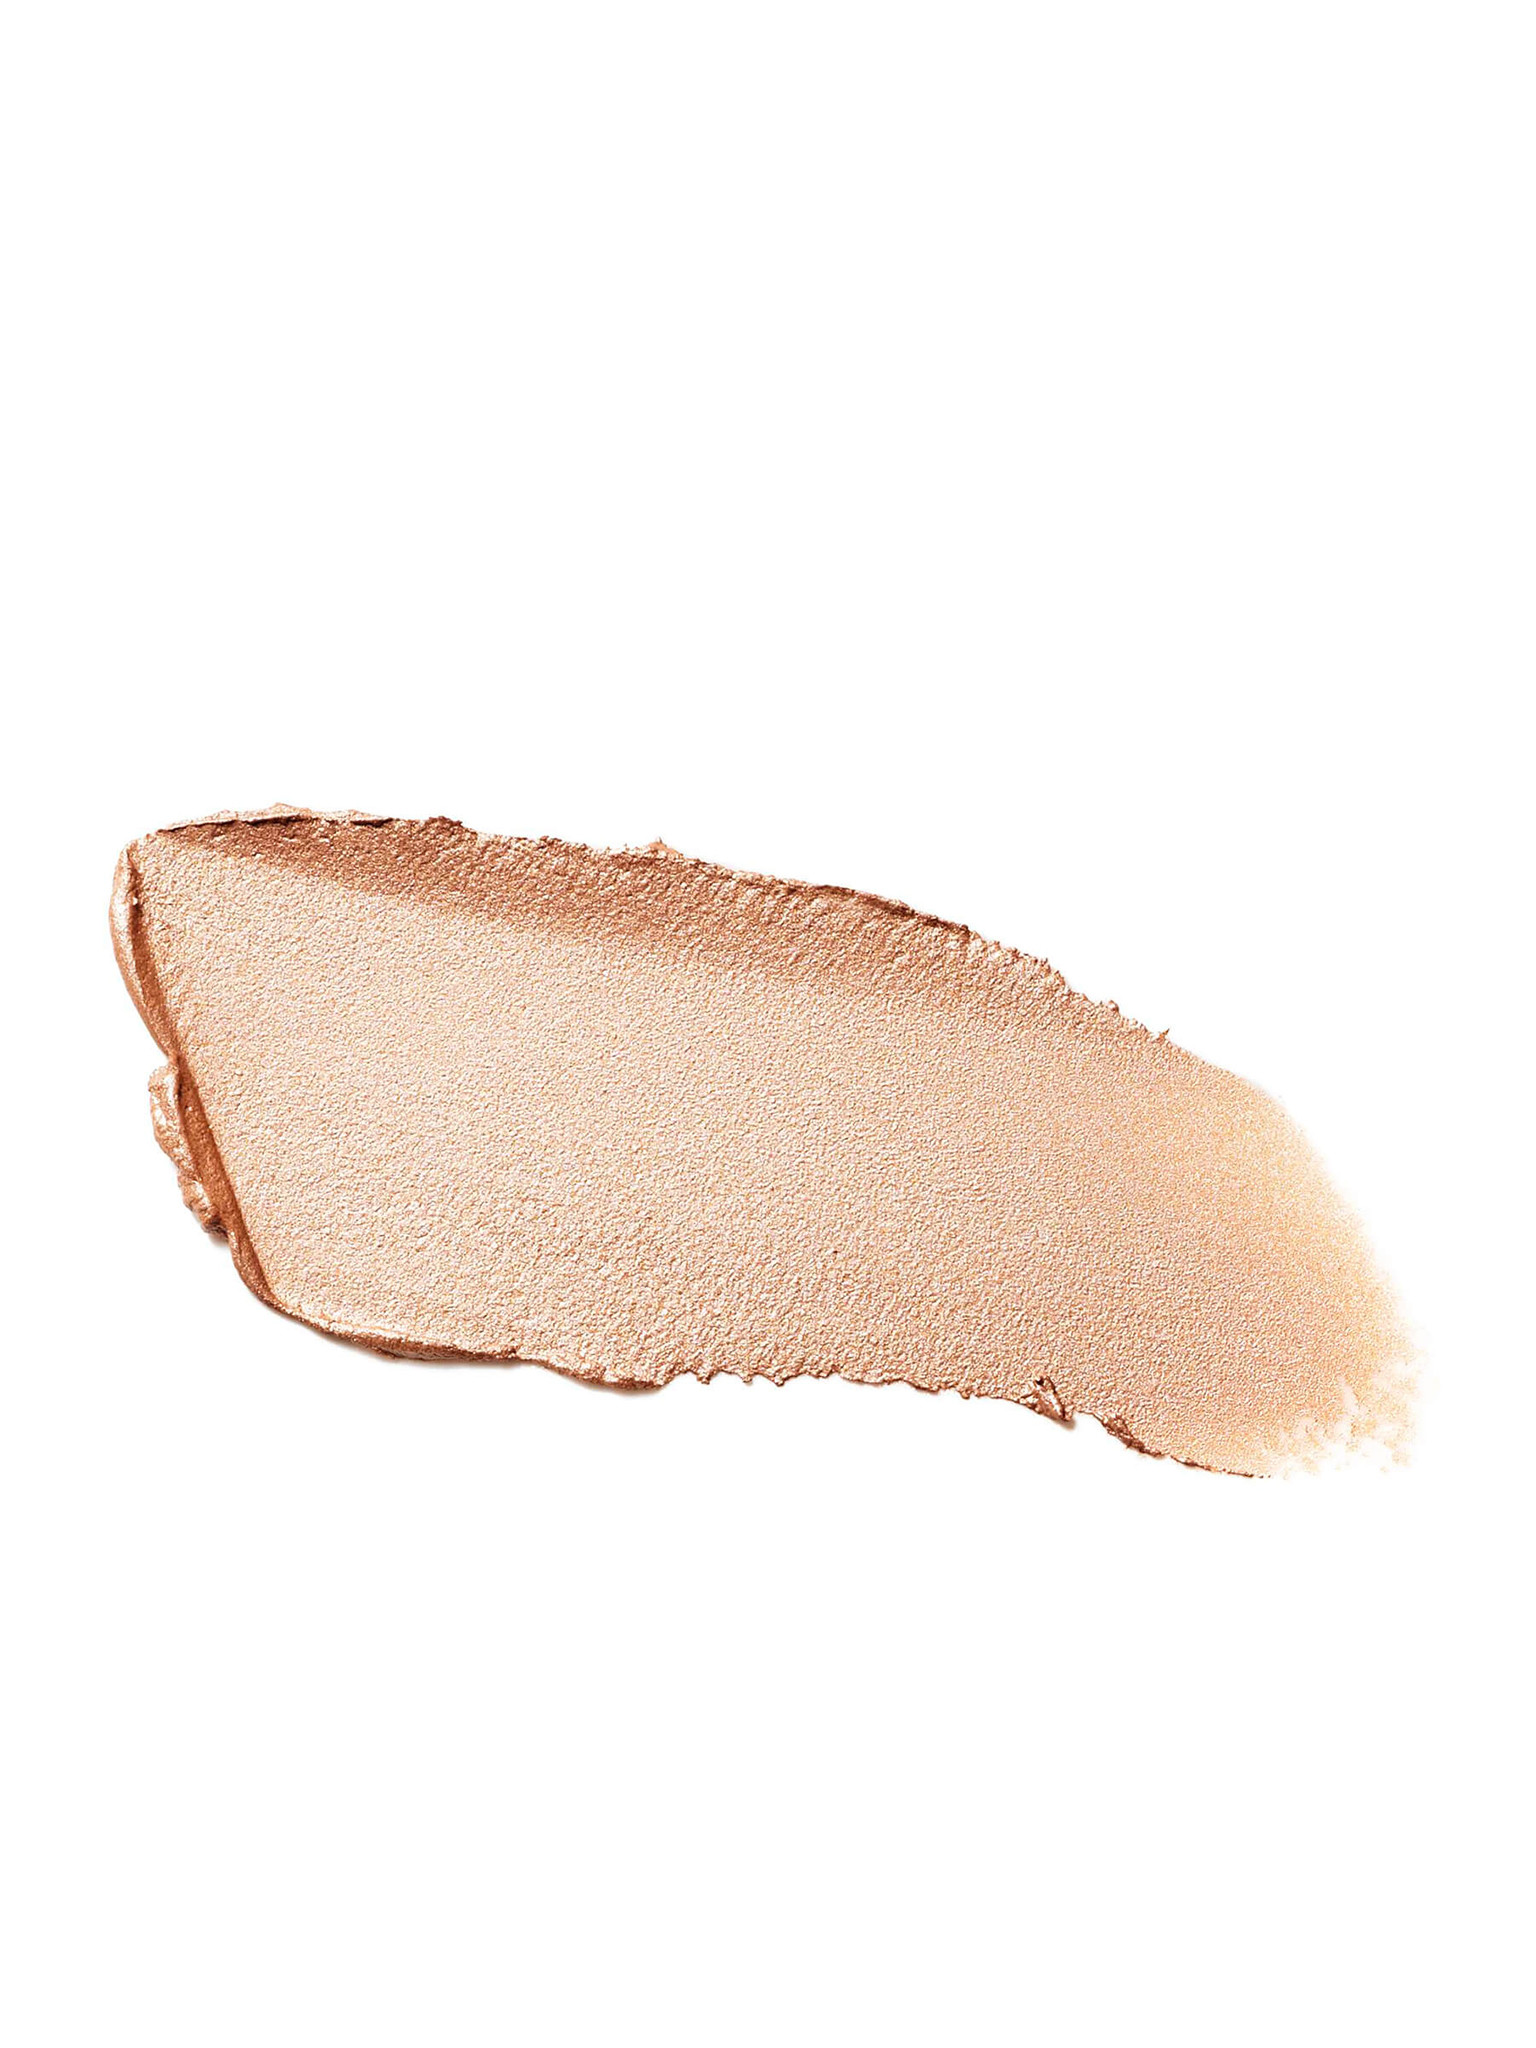 Watts Up Cream to Powder Soft Focus Highlighter